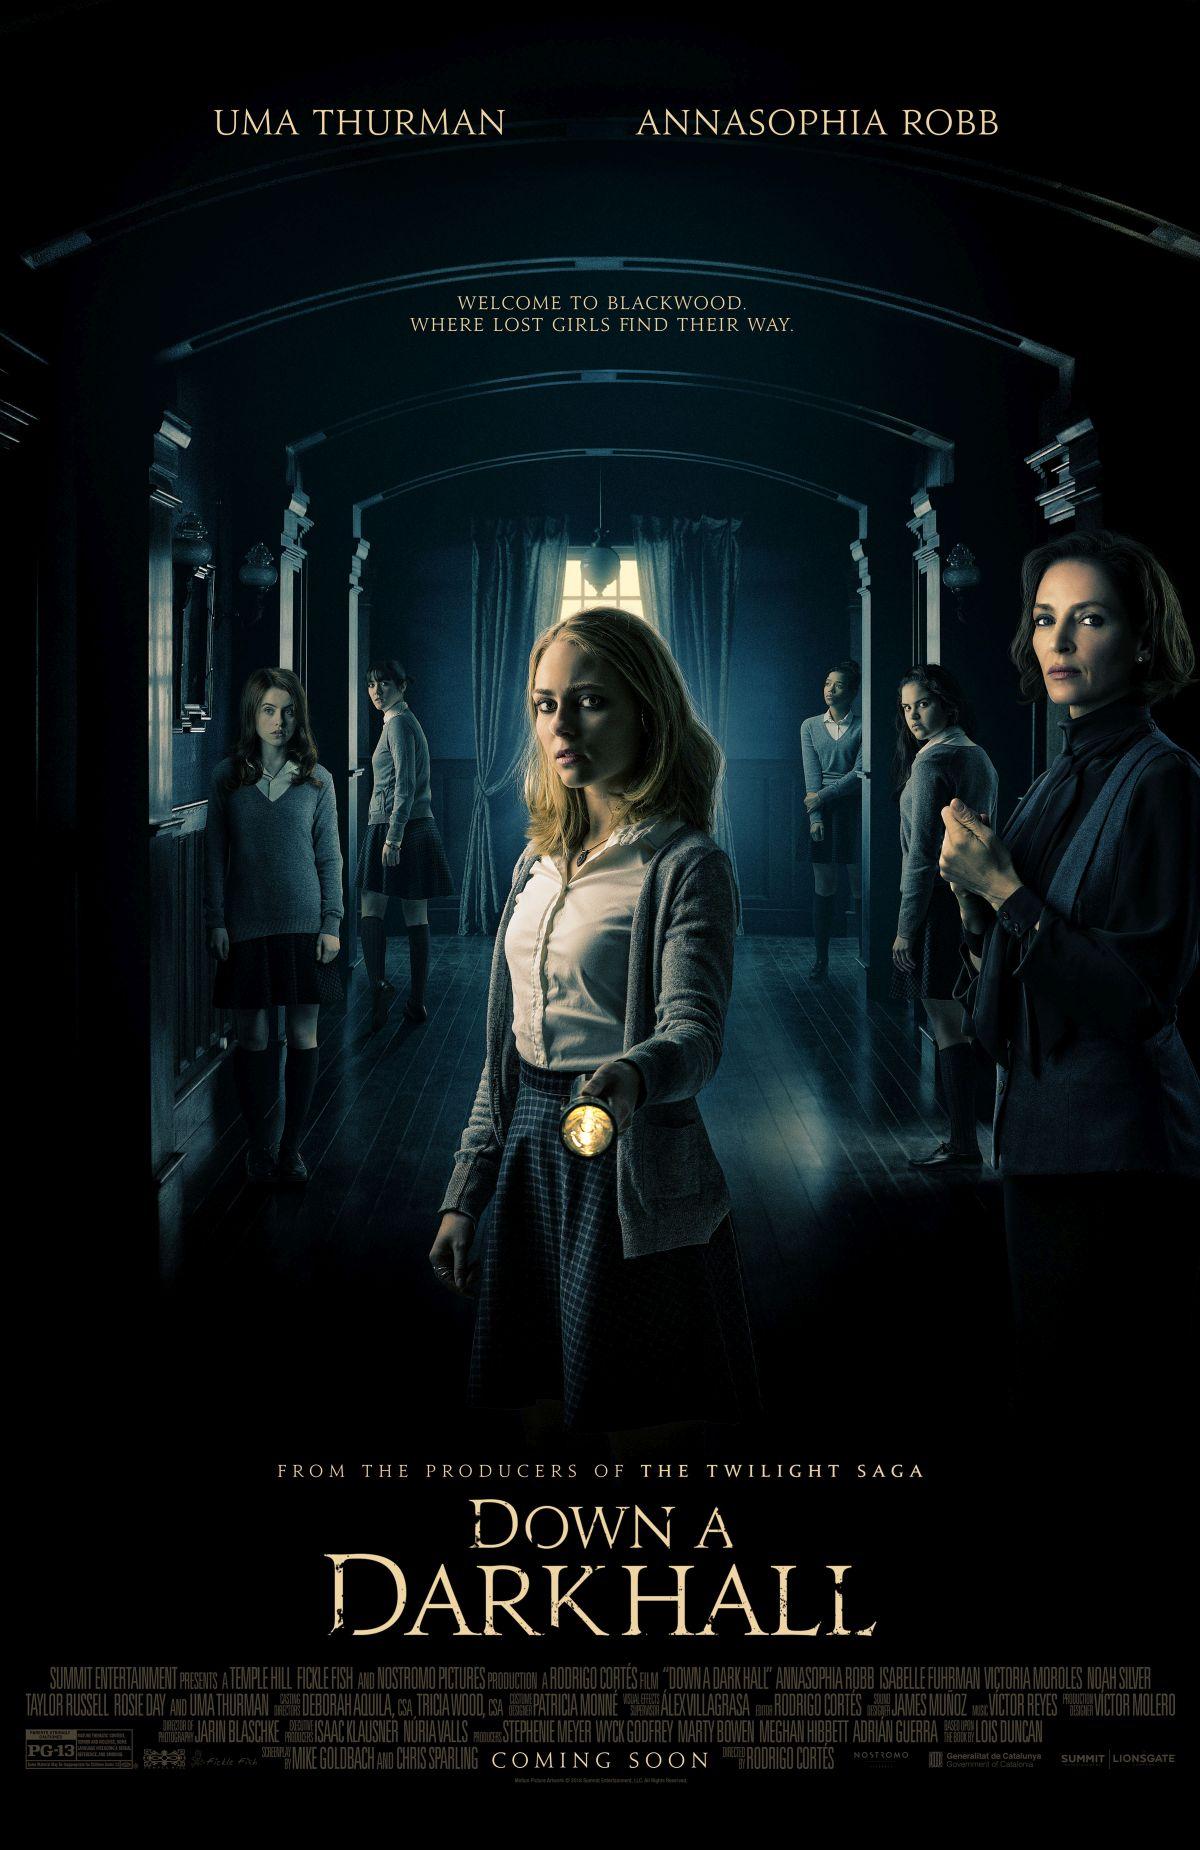 trailer-for-the-supernatural-horror-film-down-a-dark-hall-with-uma-thurman-and-annasophia-robb1